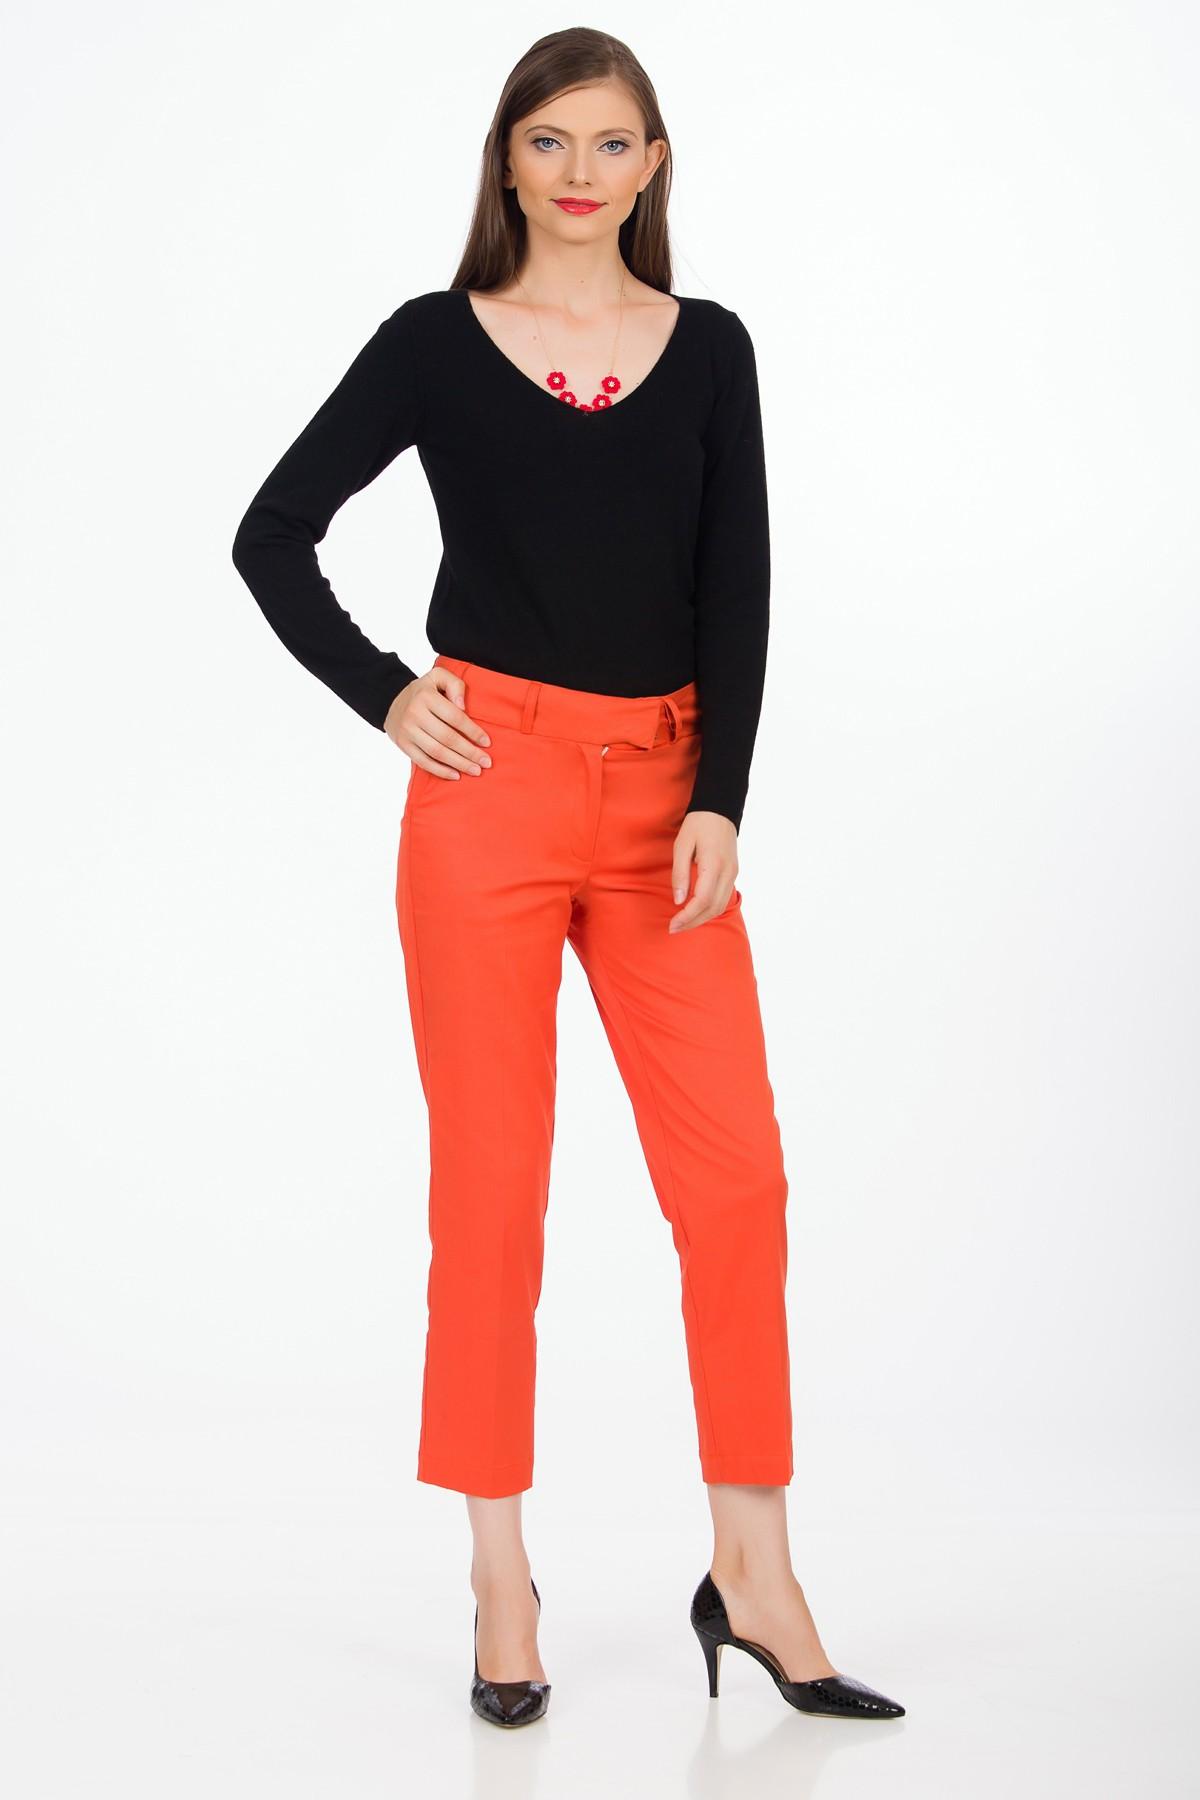 pantaloni-rosii-orange-sense